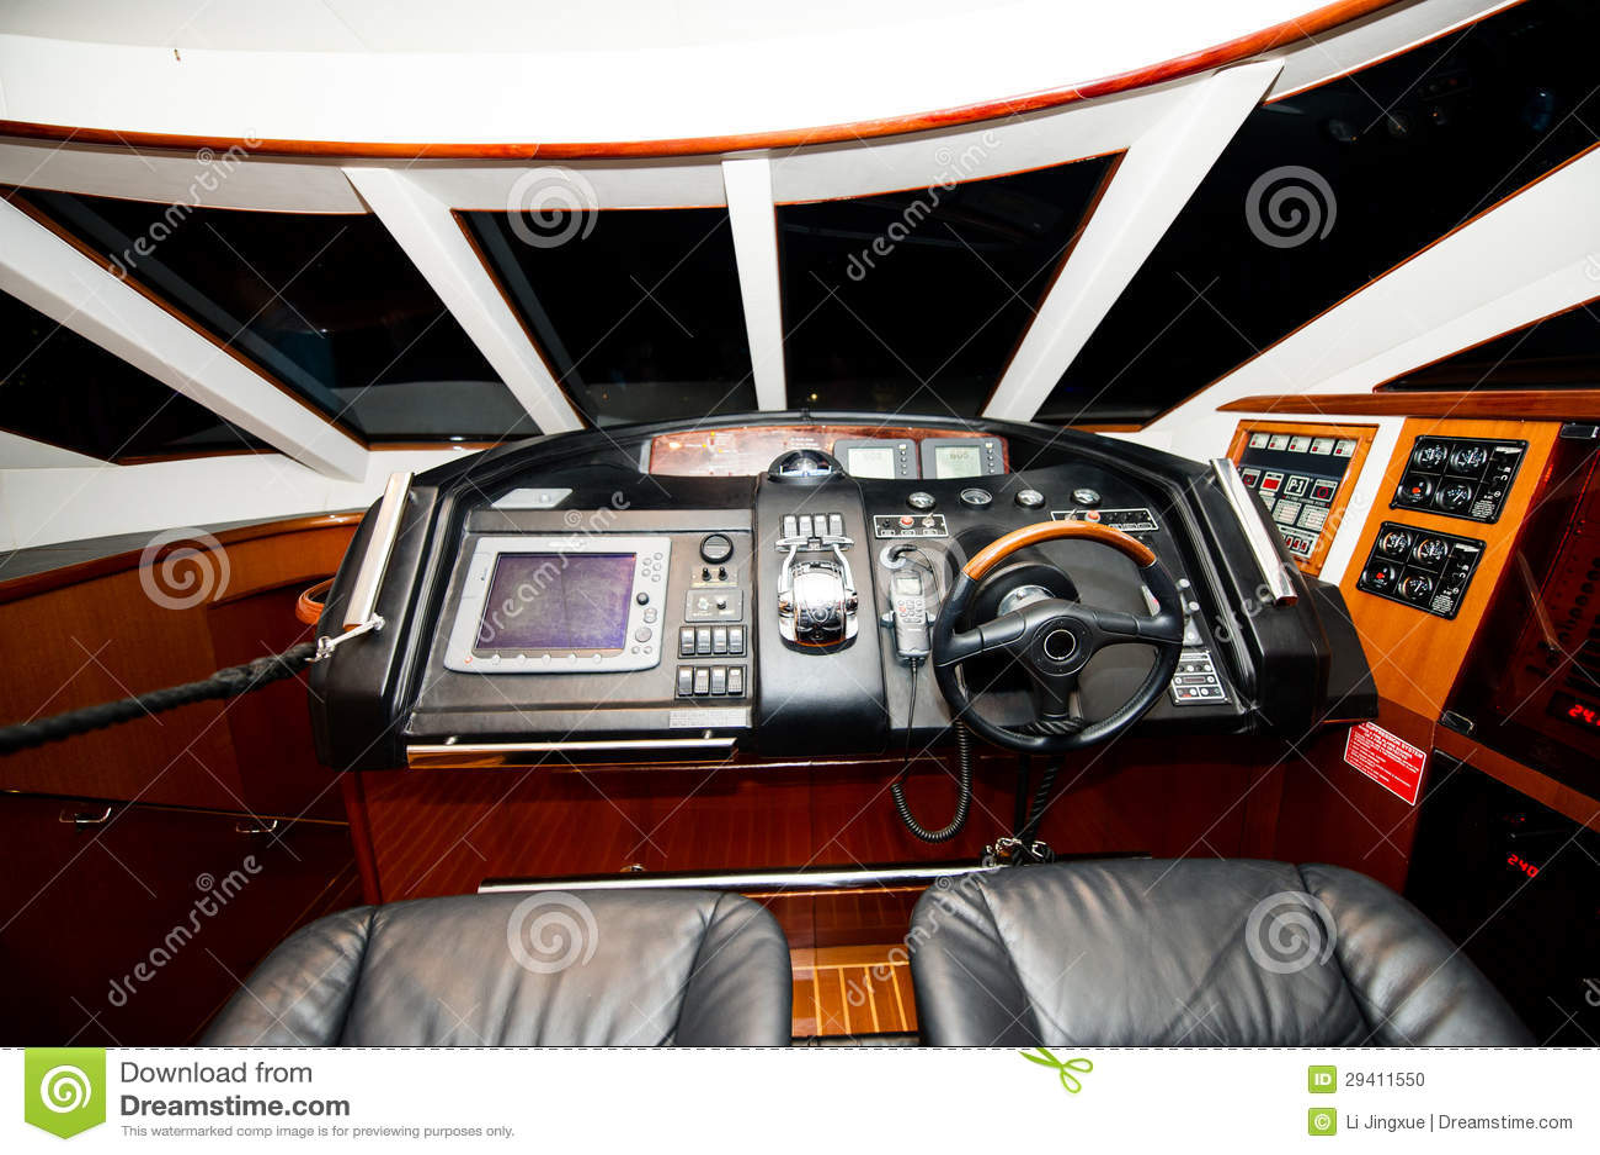 Boat Cockpit Stock Photo - Image: 29411550